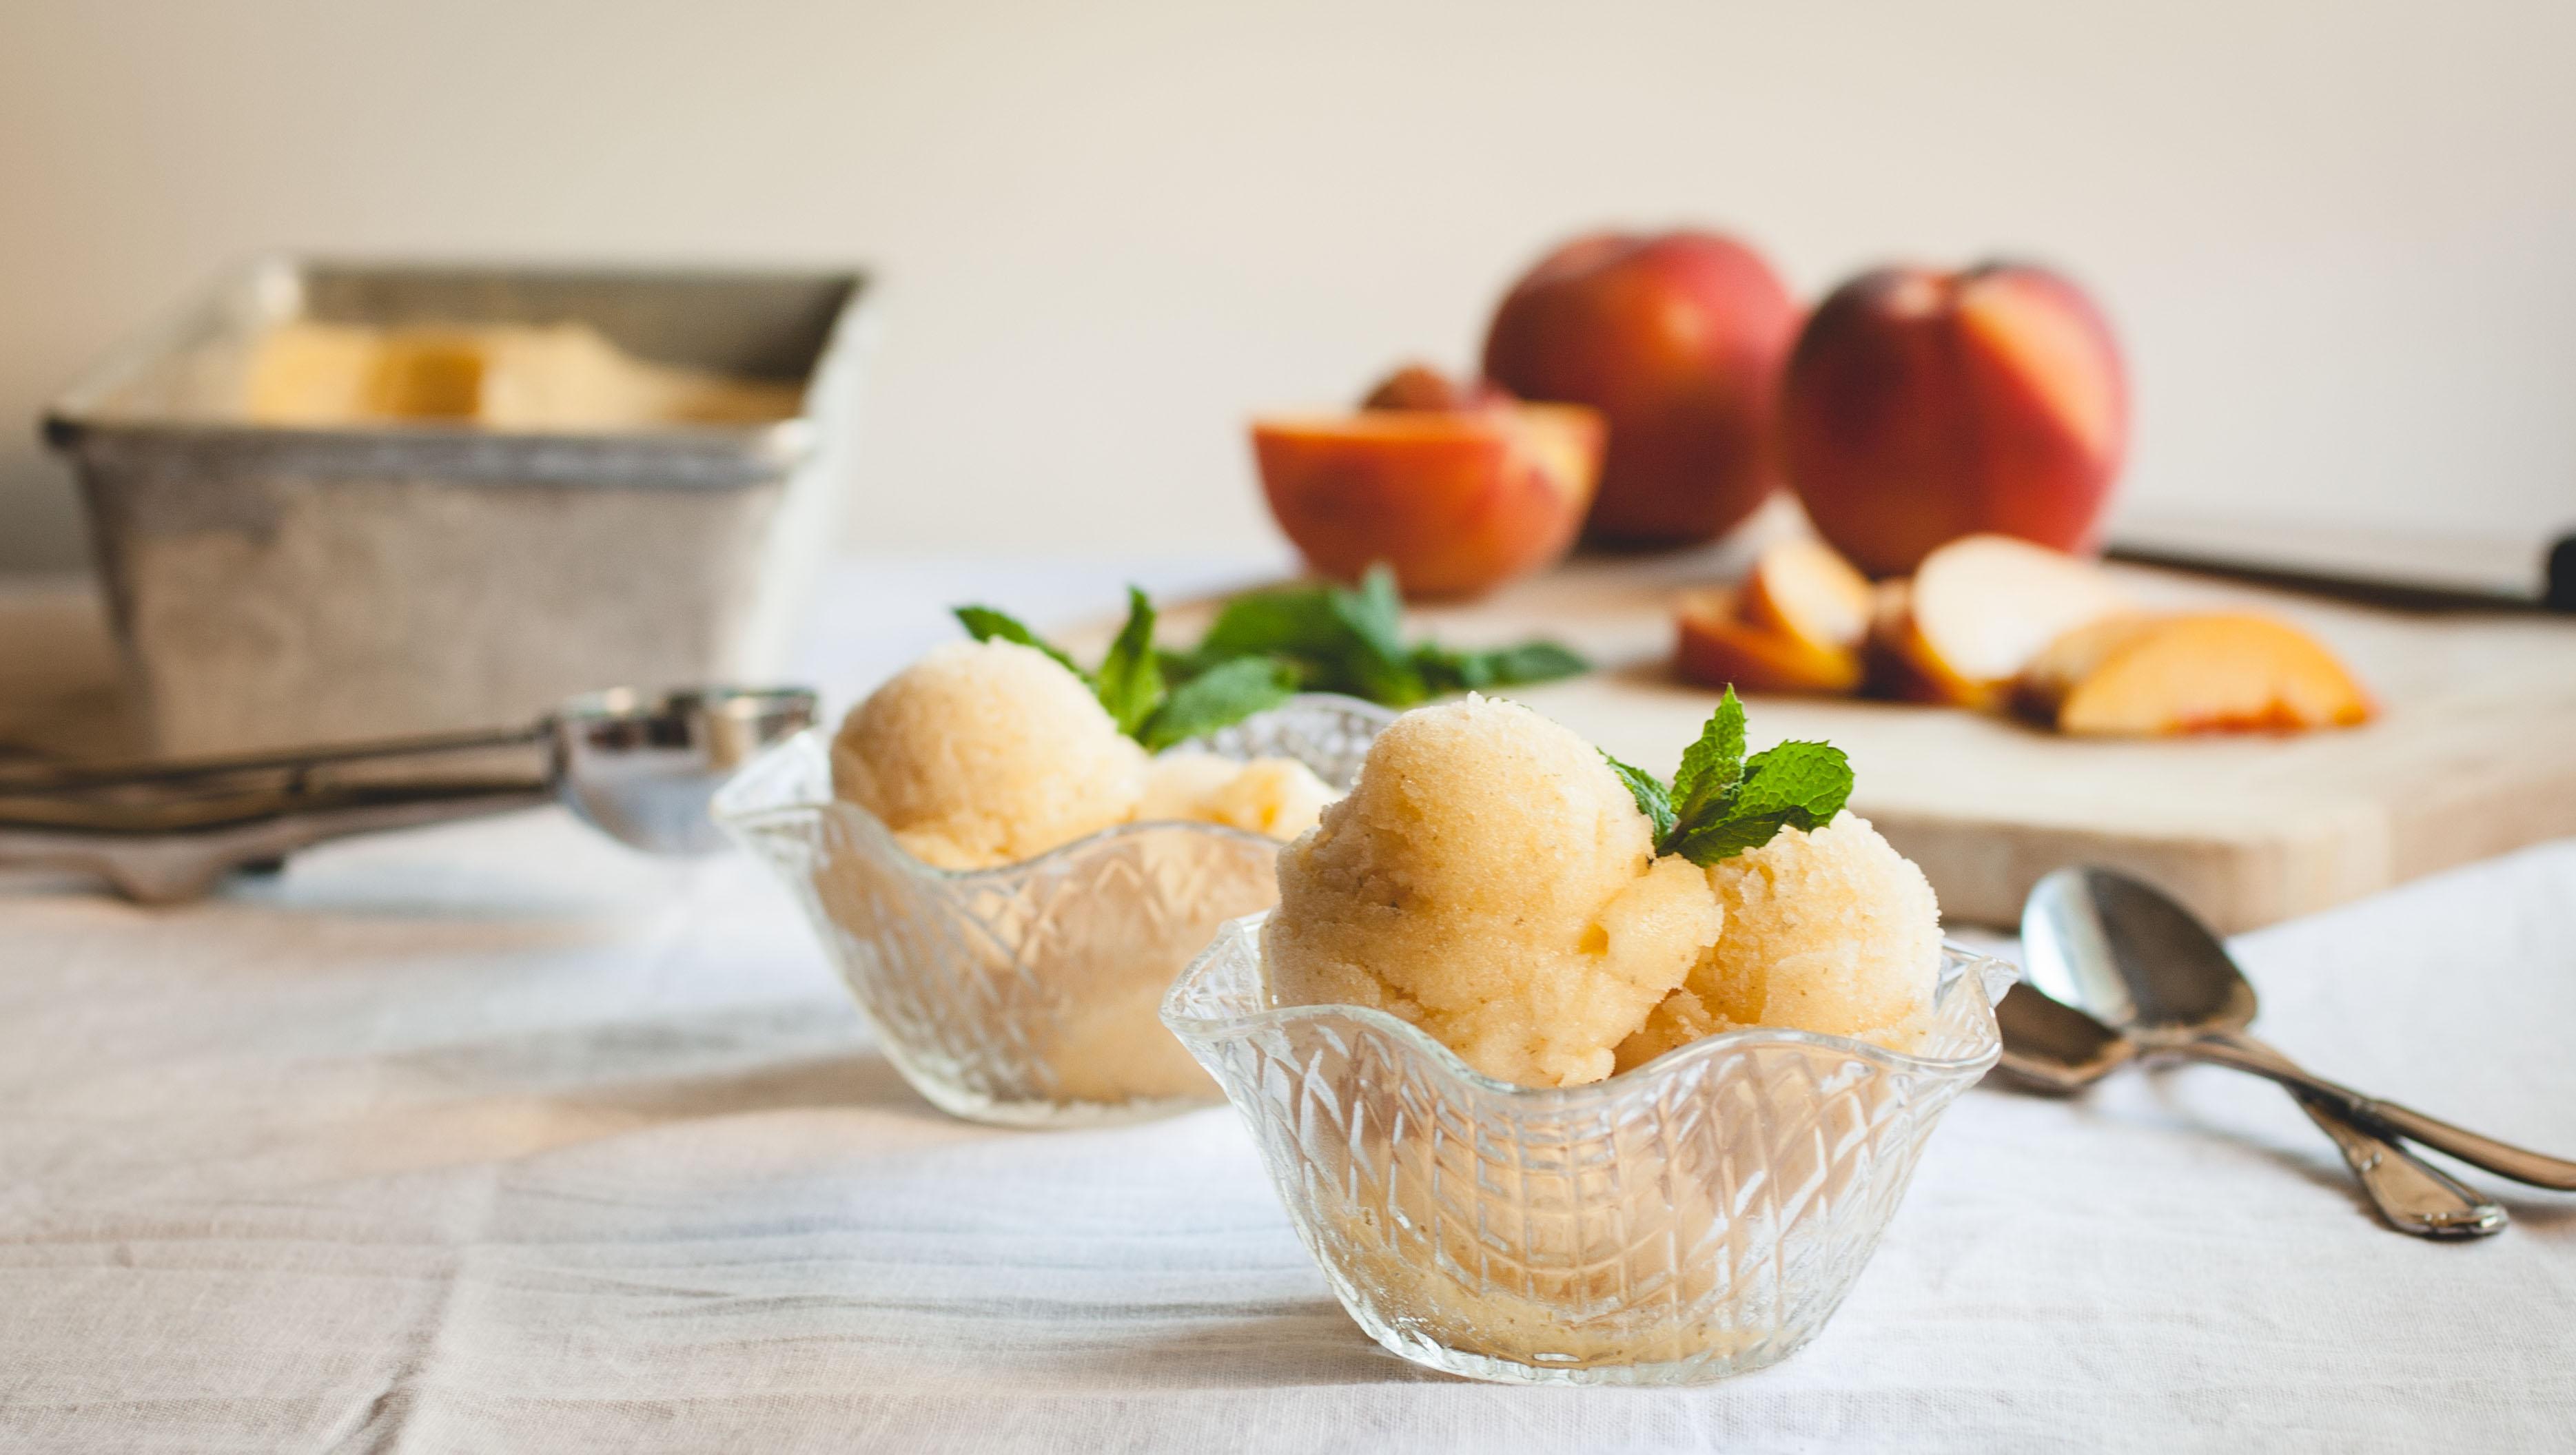 peach-sav-blanc-sorbet-39-5